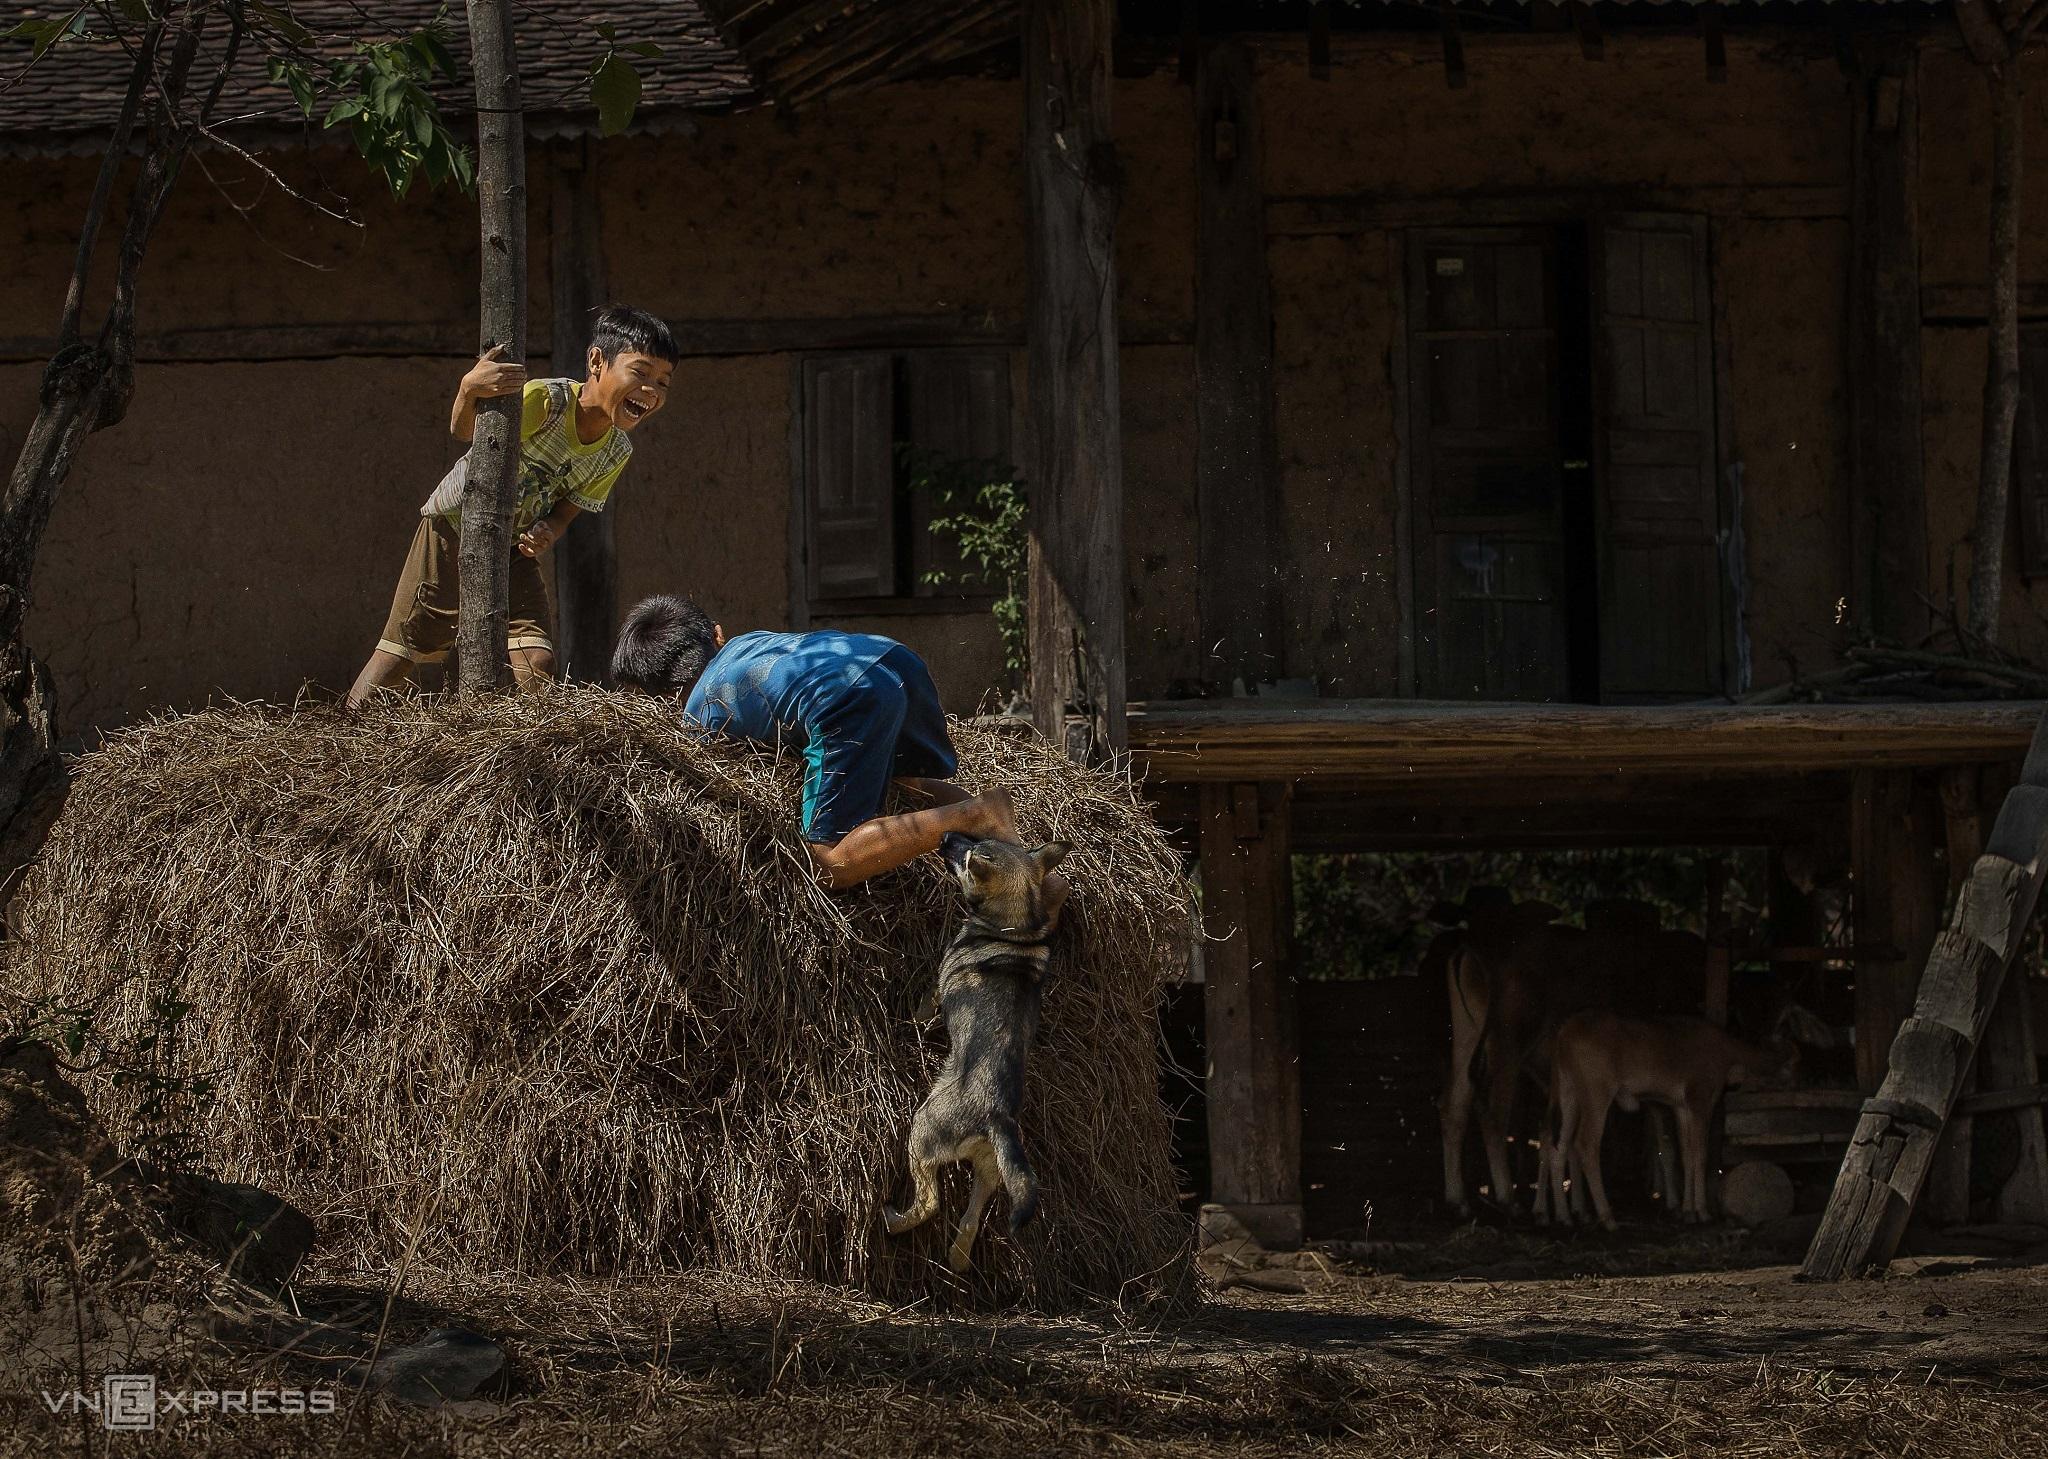 A Kon Tum journey through childhood